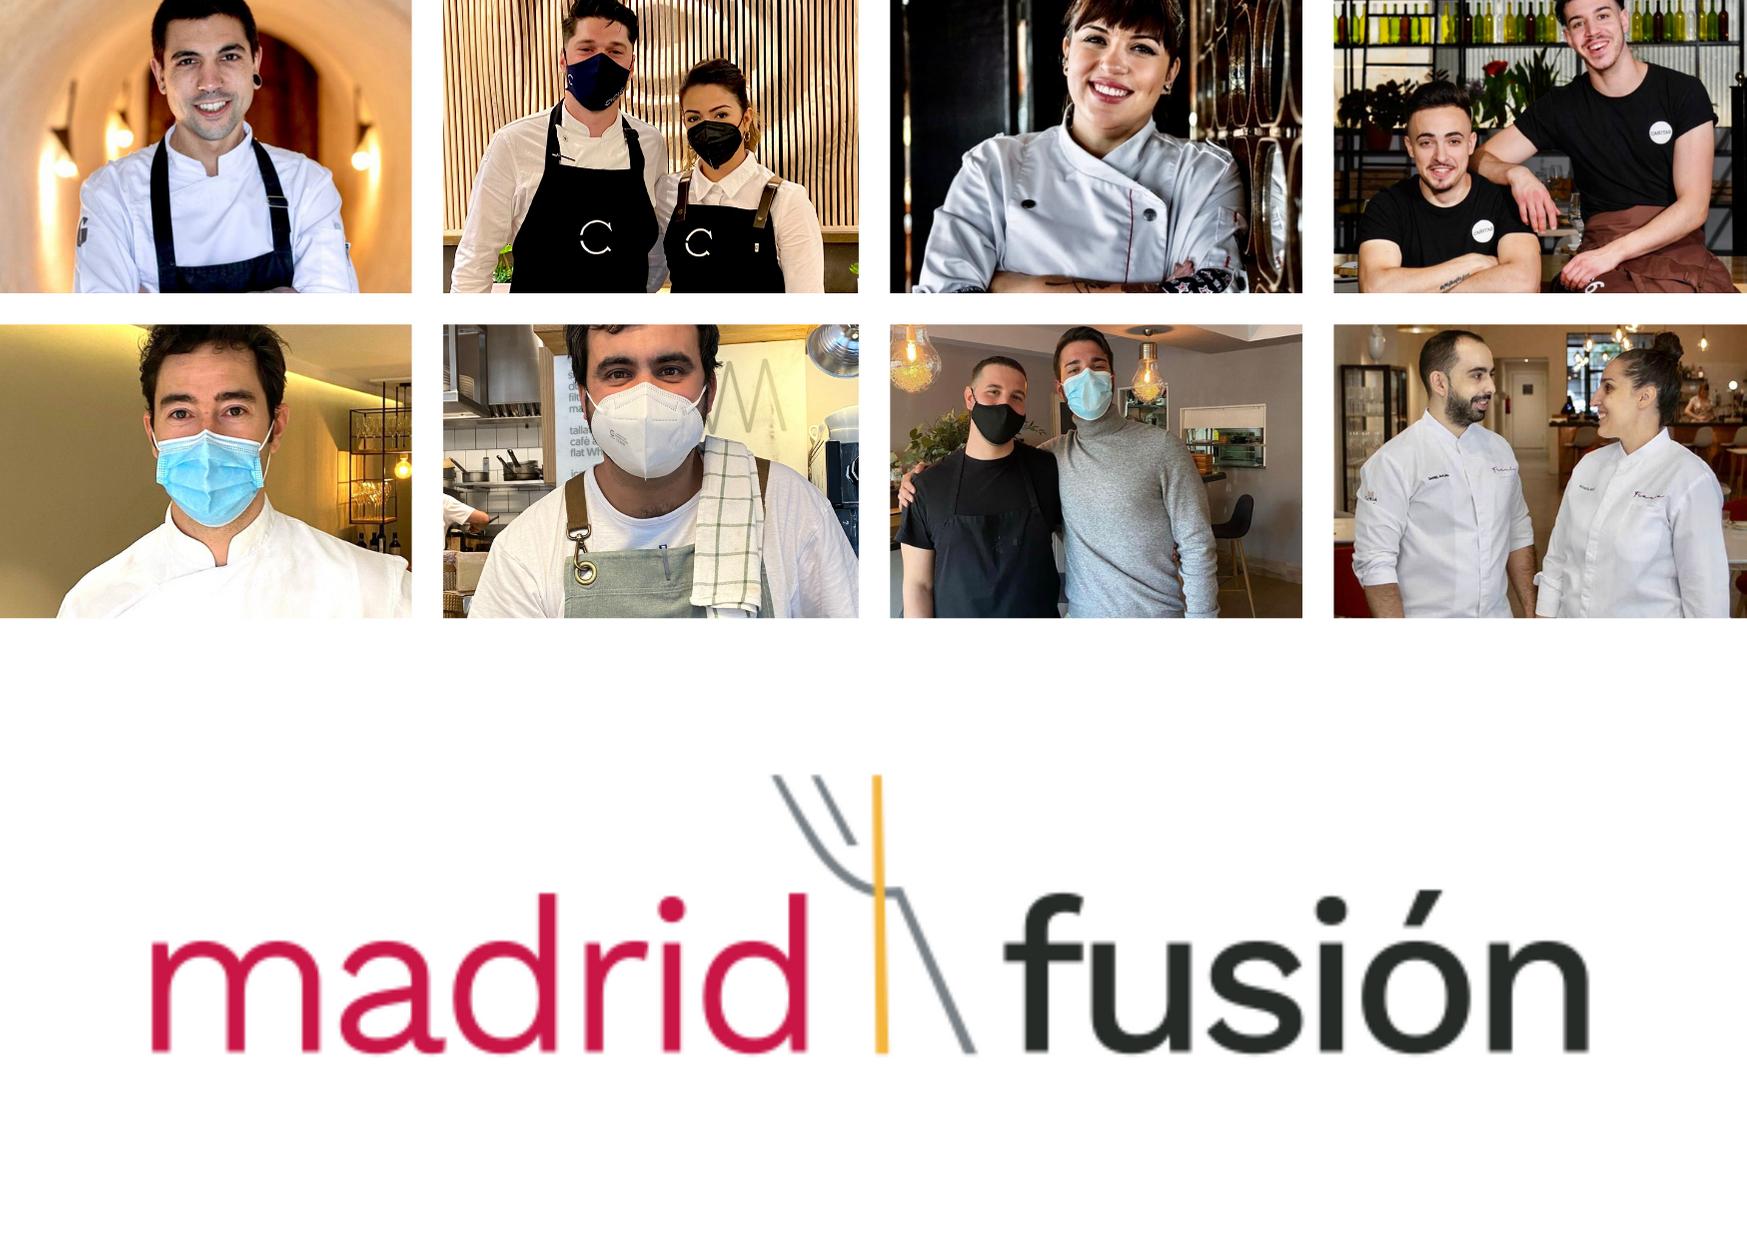 Madrid Fusión